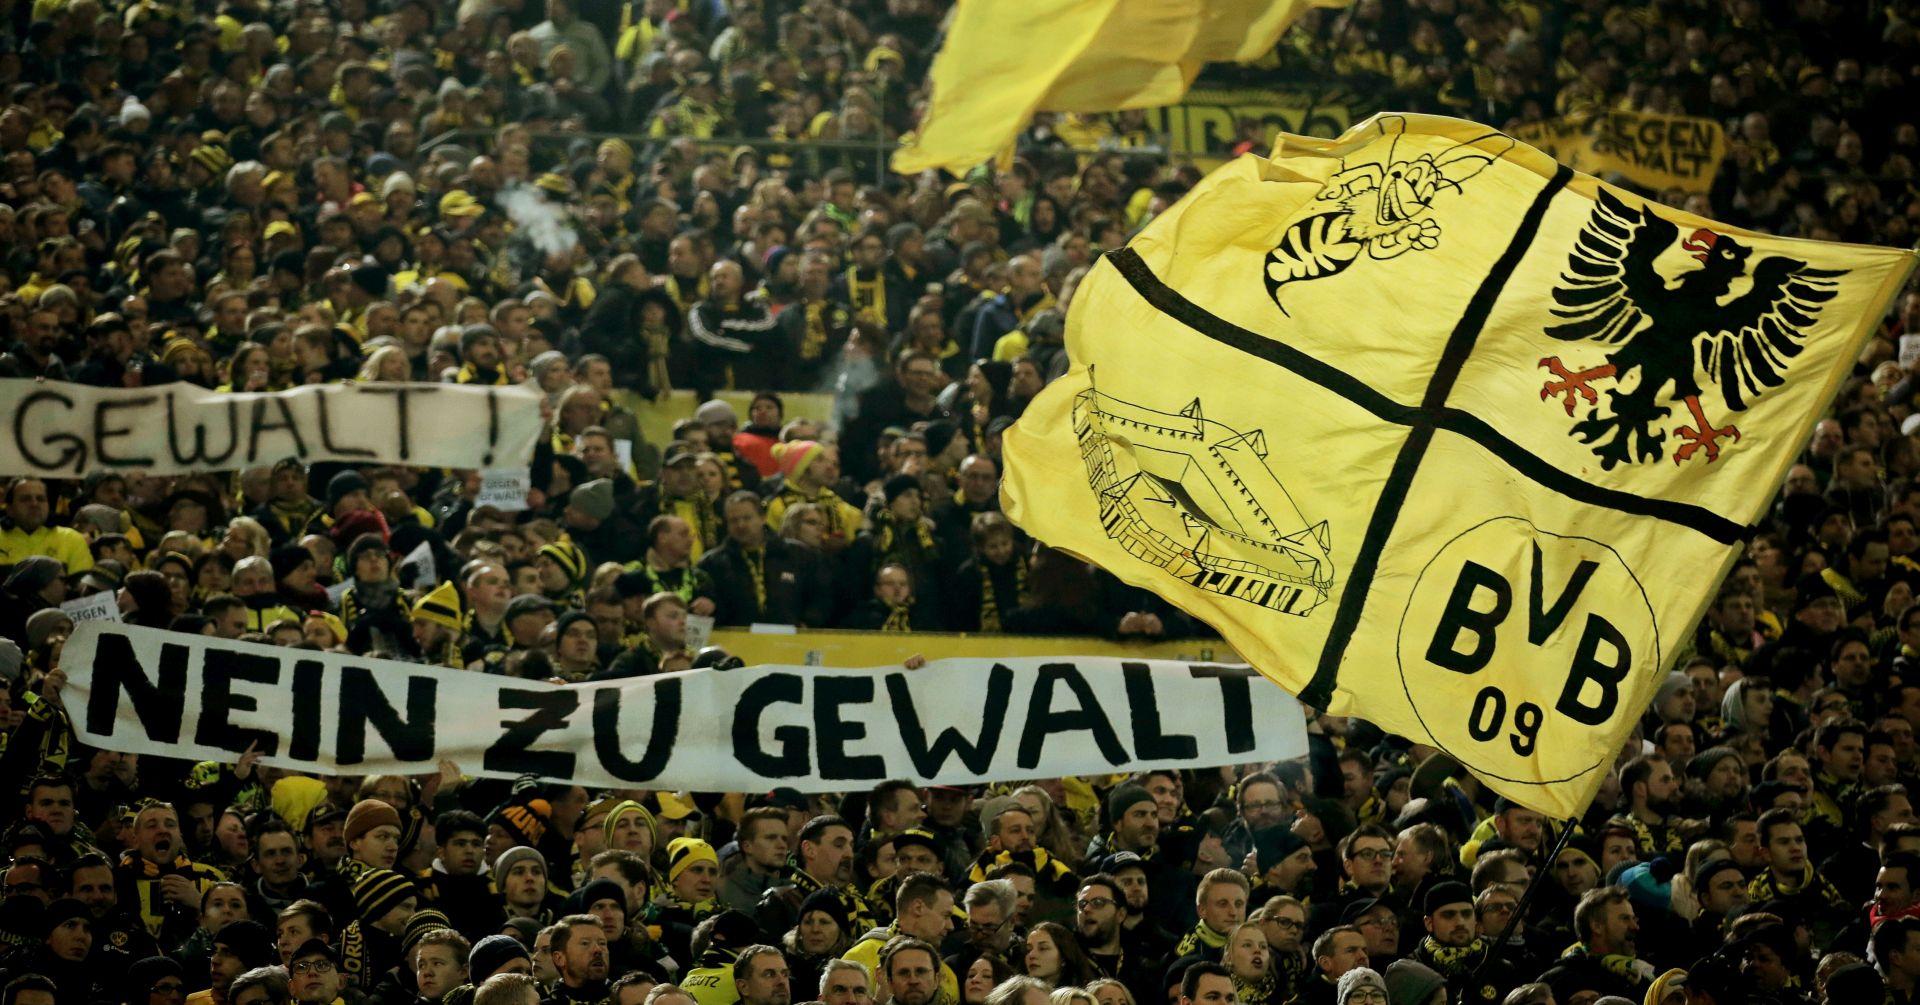 Borussia suspendirala Dembelea 'do daljnjega'